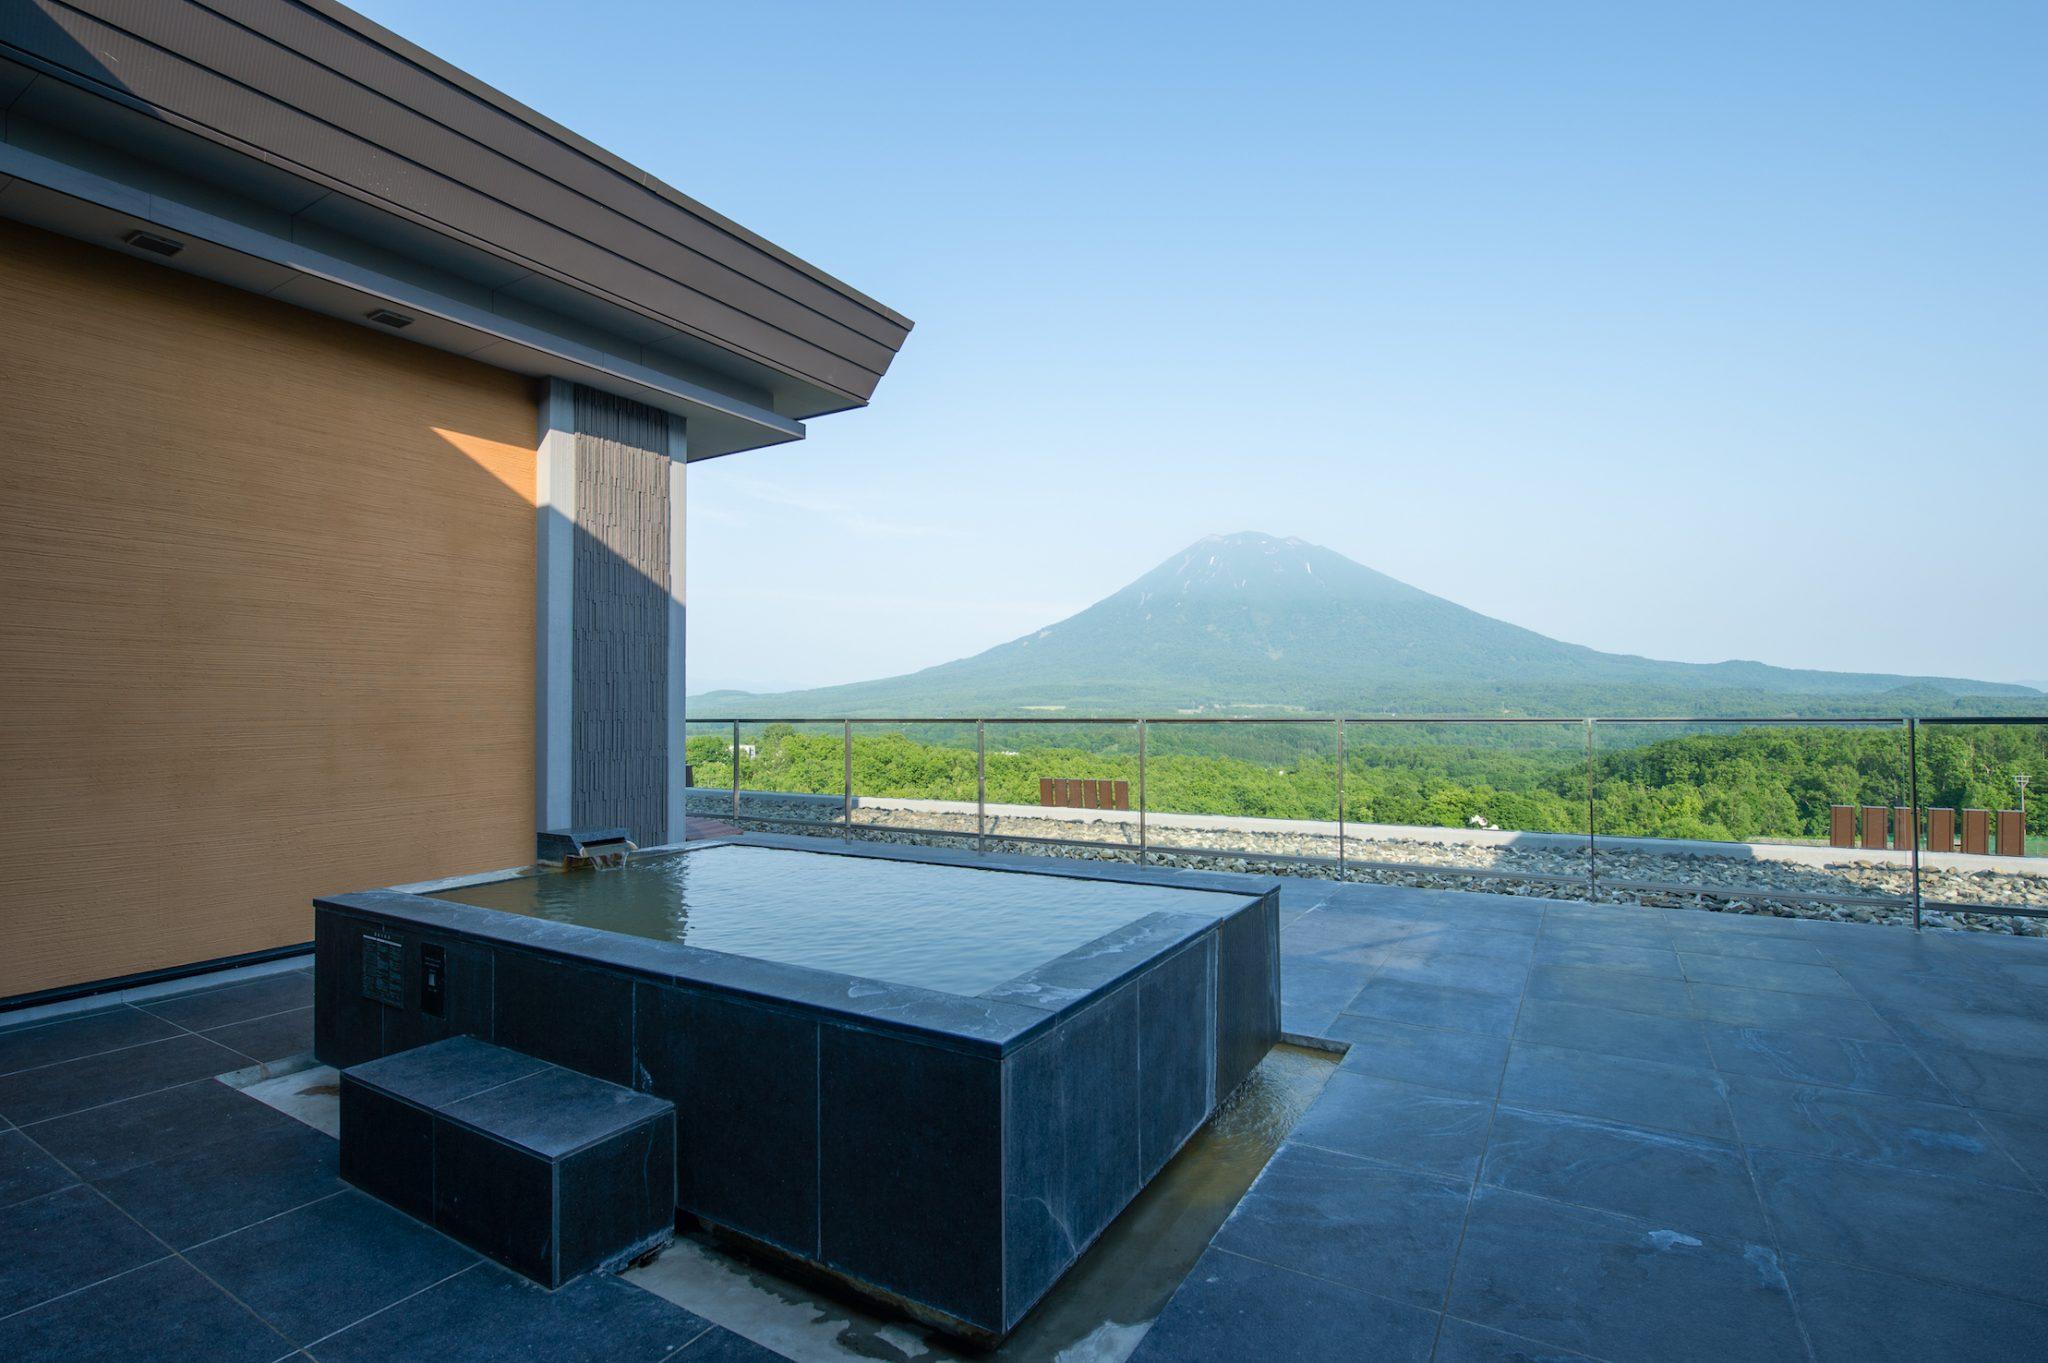 aya-niseko-penthouse-a-summer-3